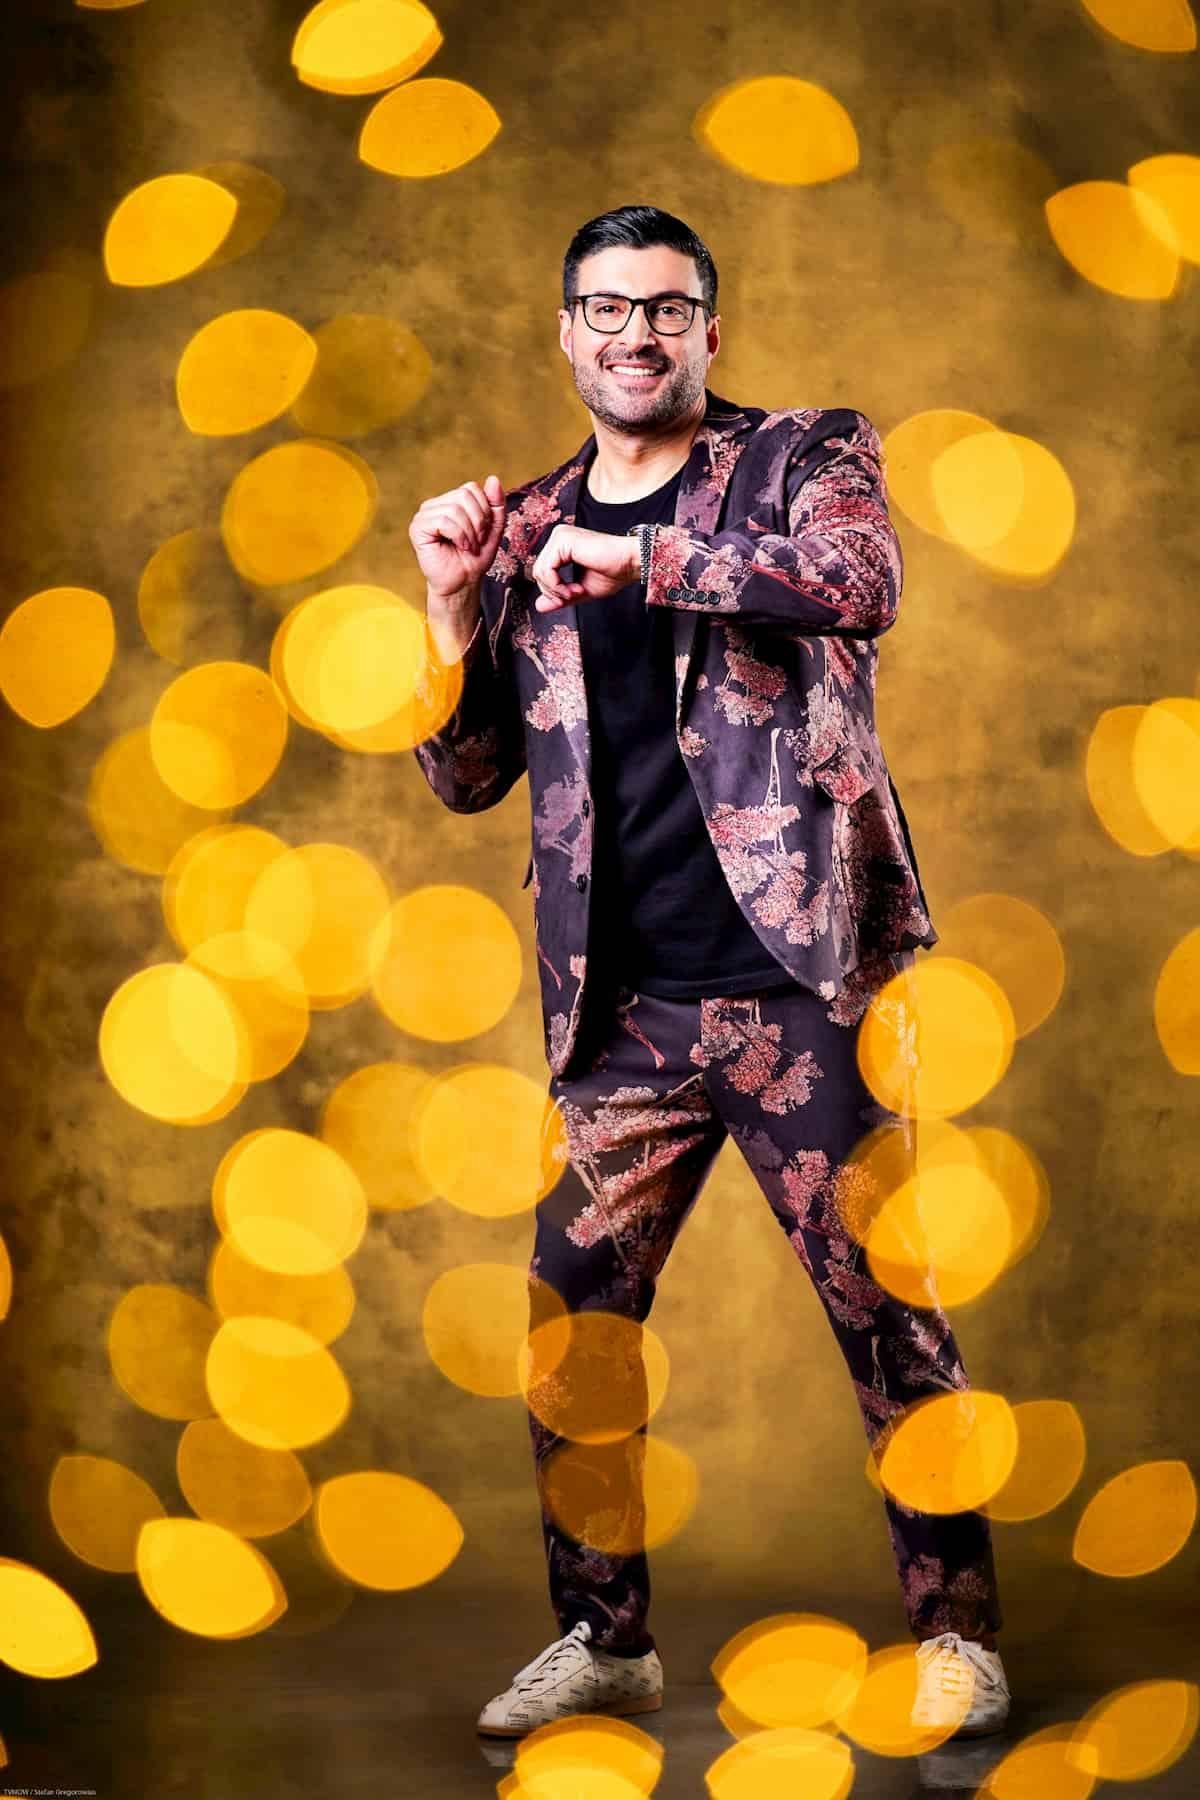 Sükrü Pehlivan bei Let's dance 2020 Prominenter Kandidat